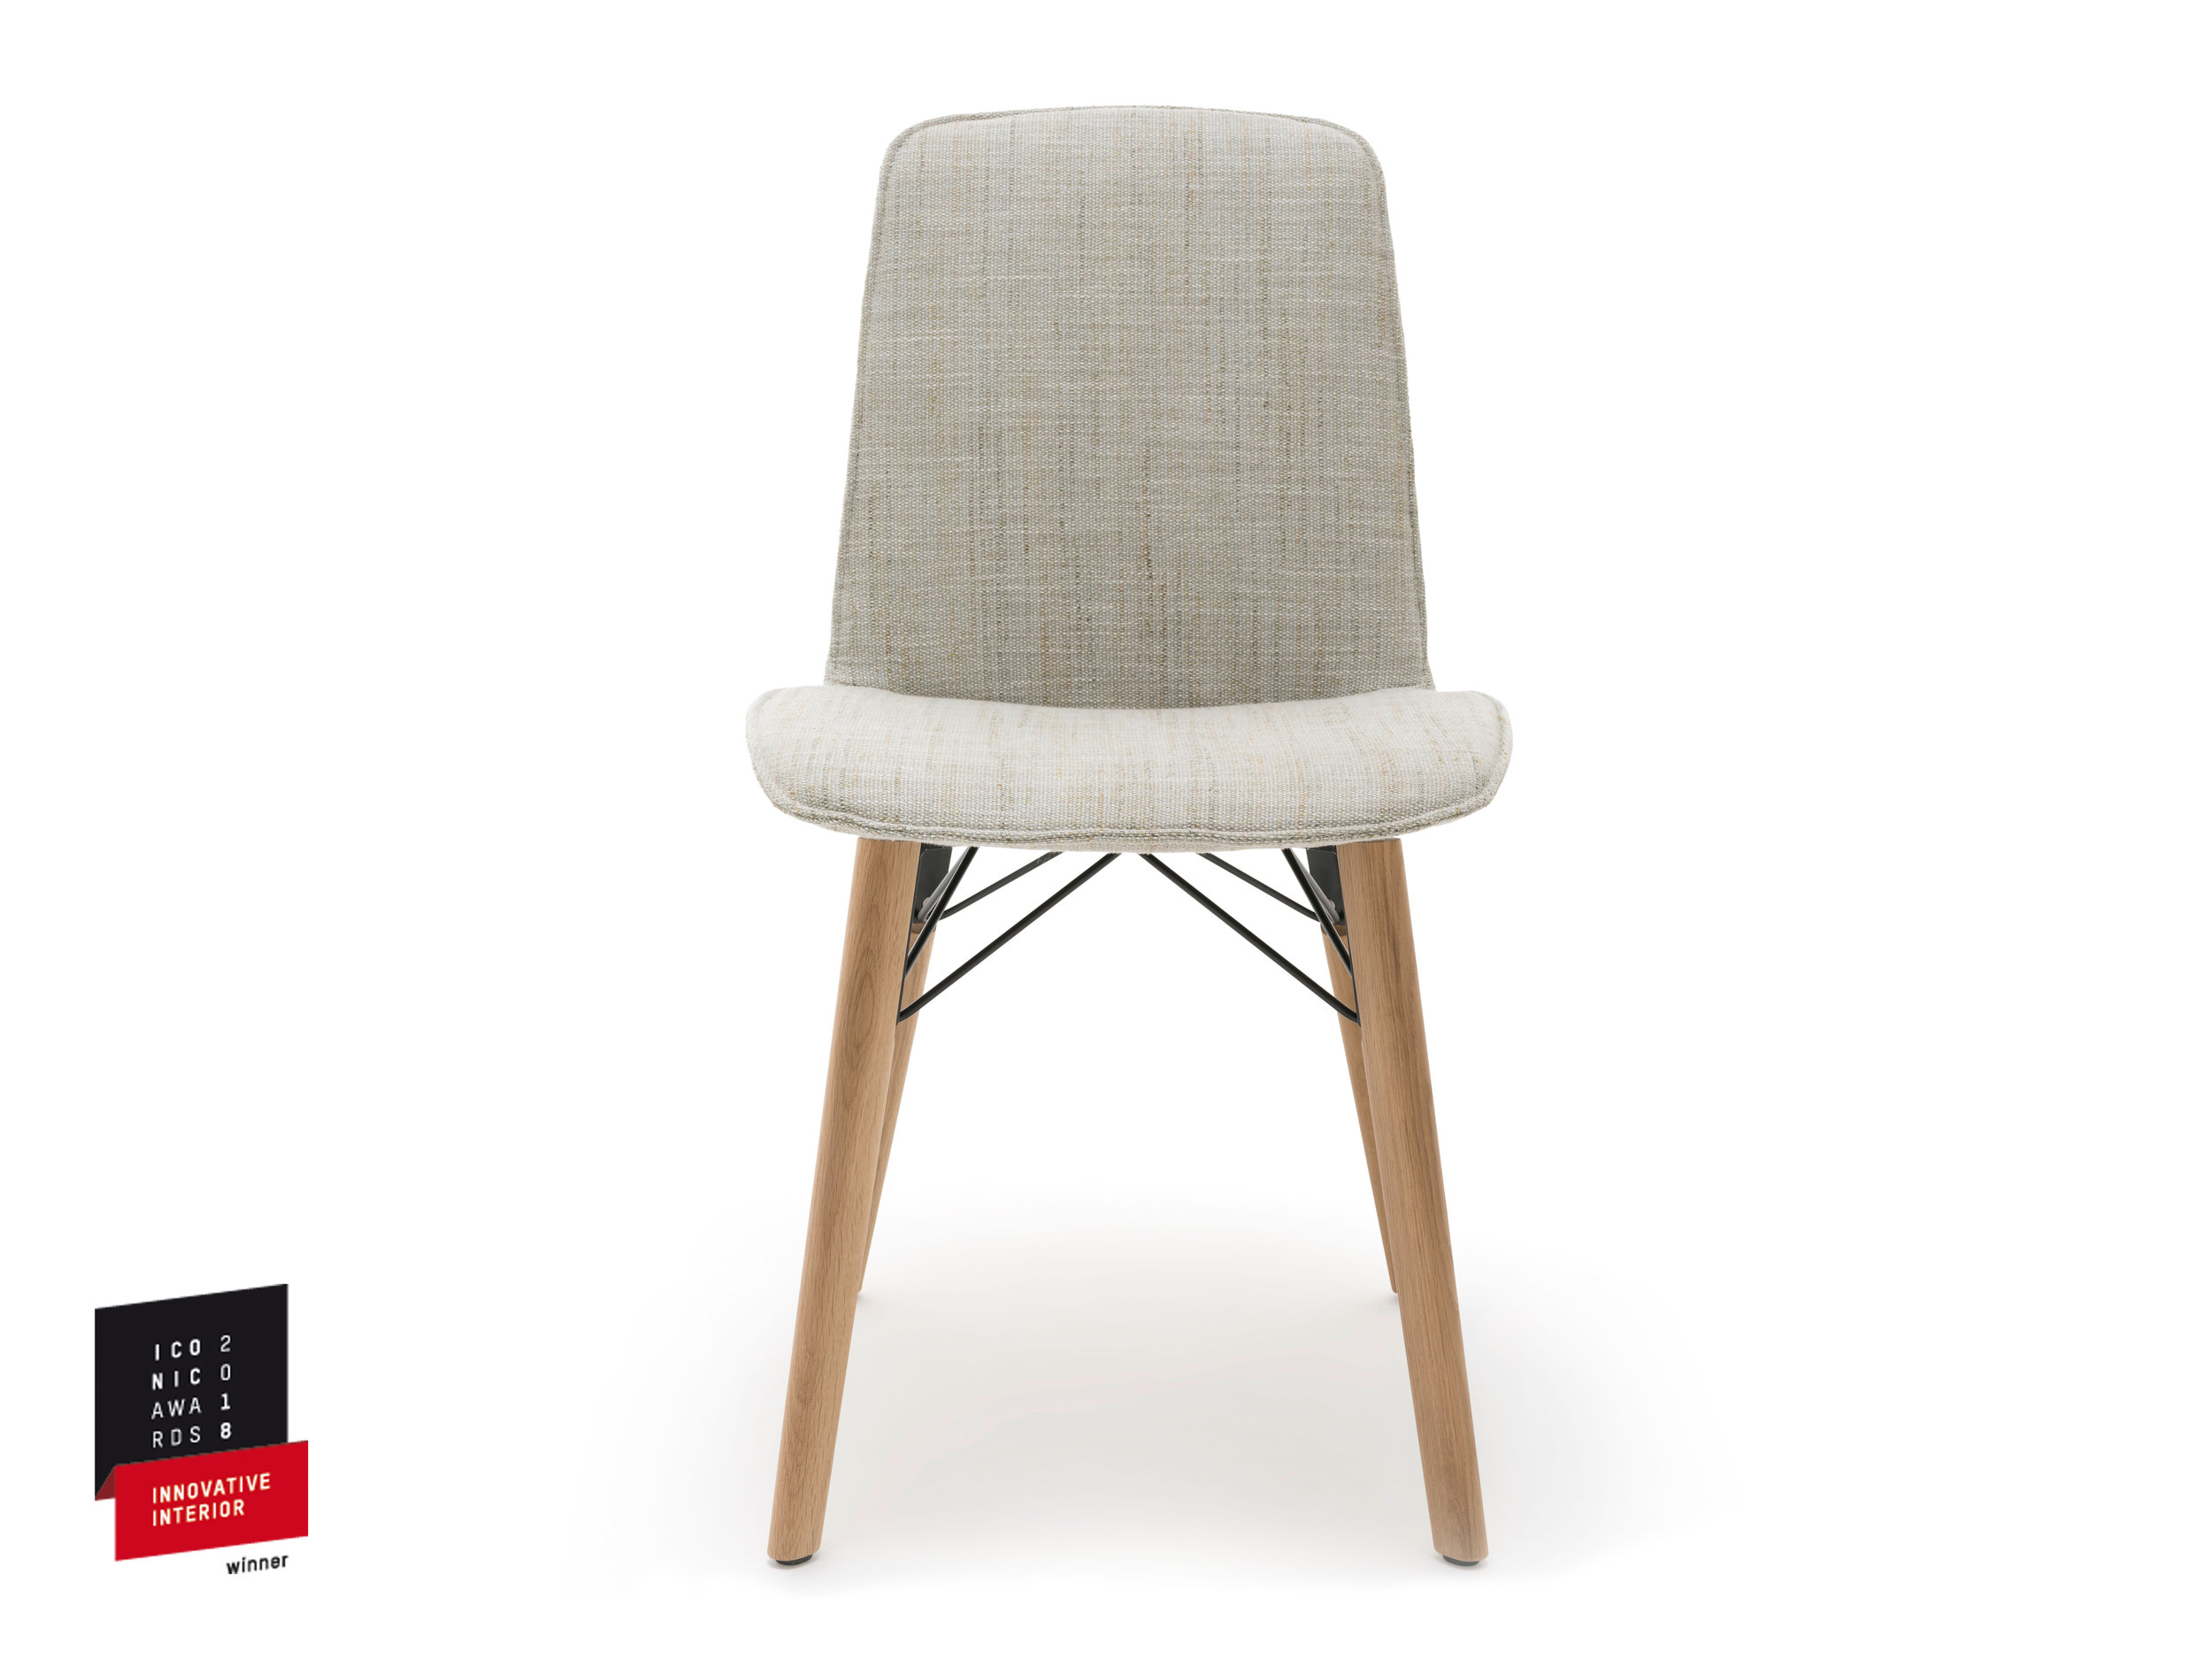 Rolf-Benz-616-Chair-Johannes-Steinbauer-Office-for-Design-1-Iconic-Award-2018.jpg